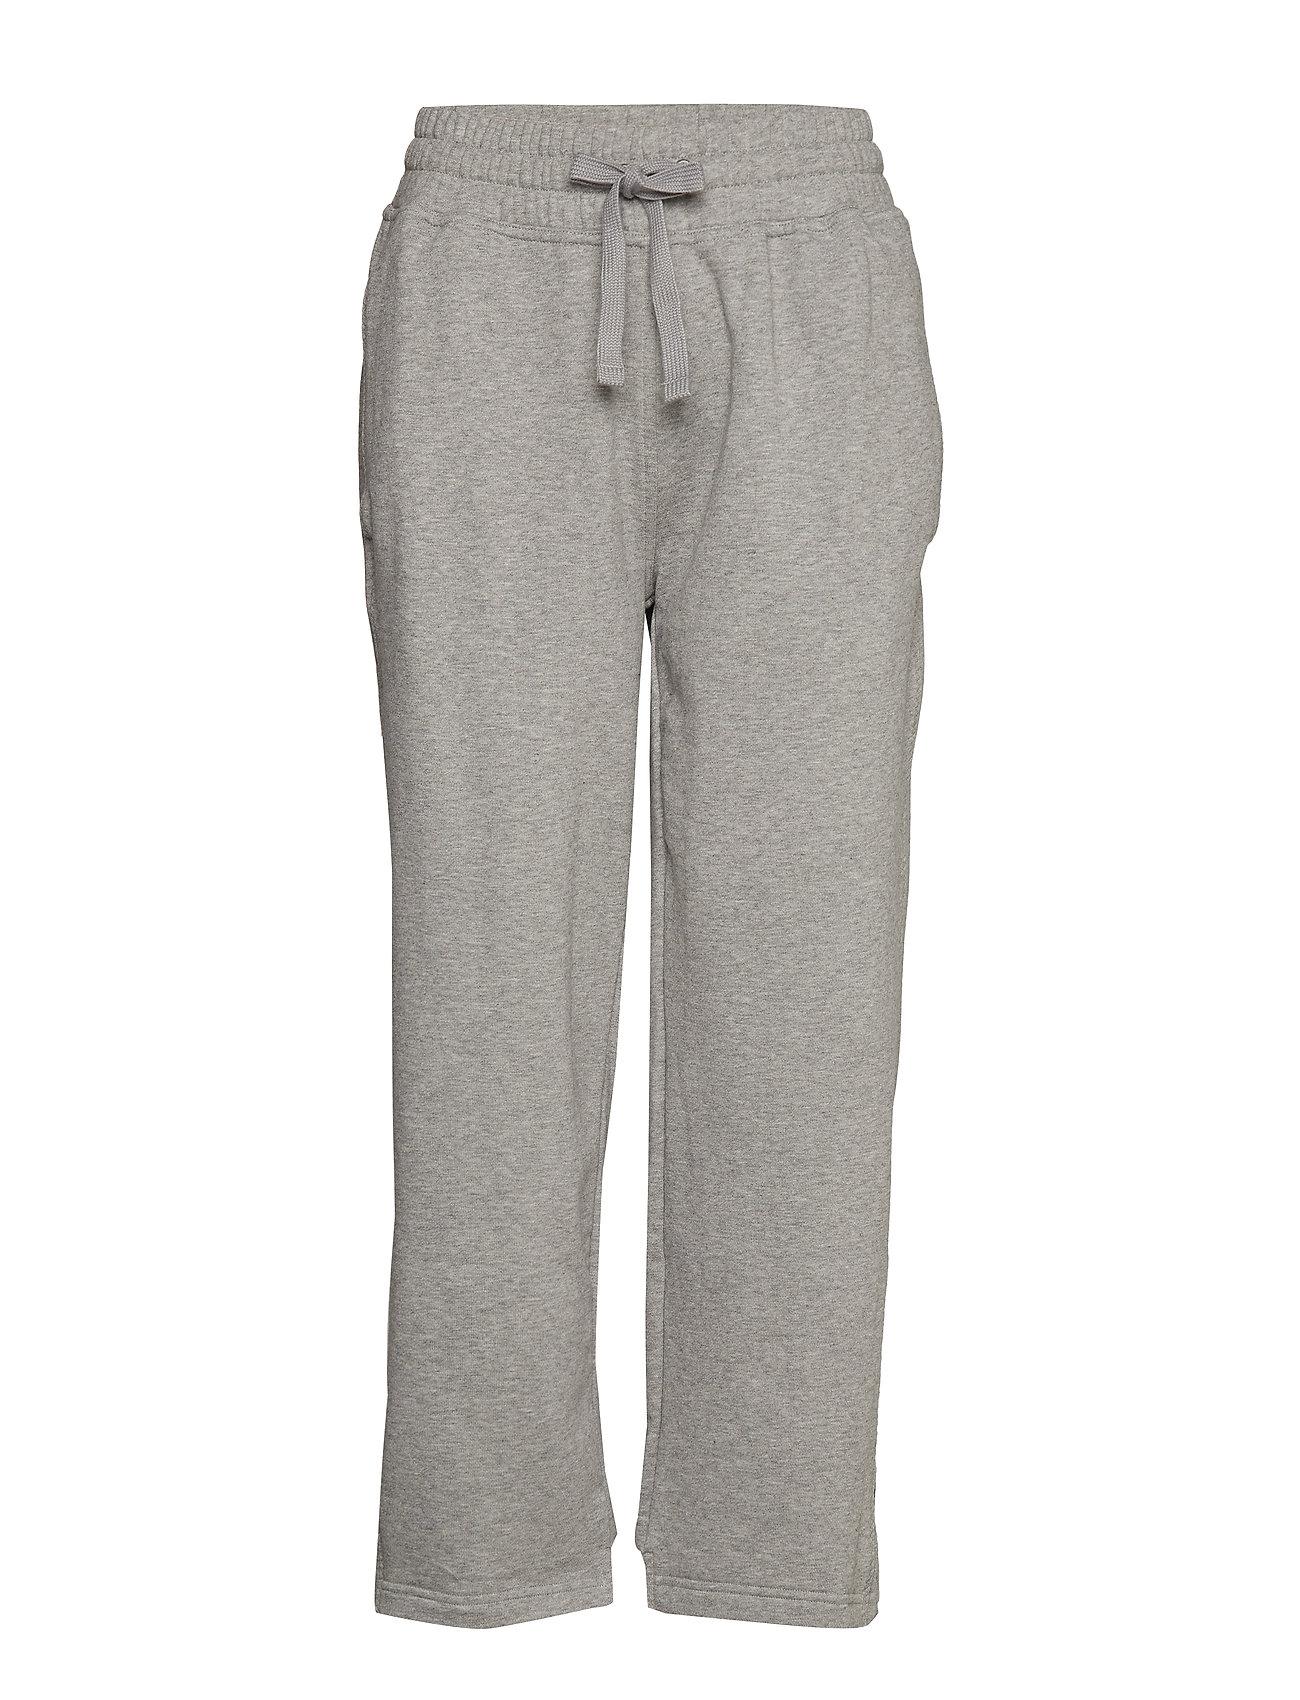 Image of Ess Sweatpant Sweatpants Hyggebukser Grå Adidas By Stella McCartney (3350774987)